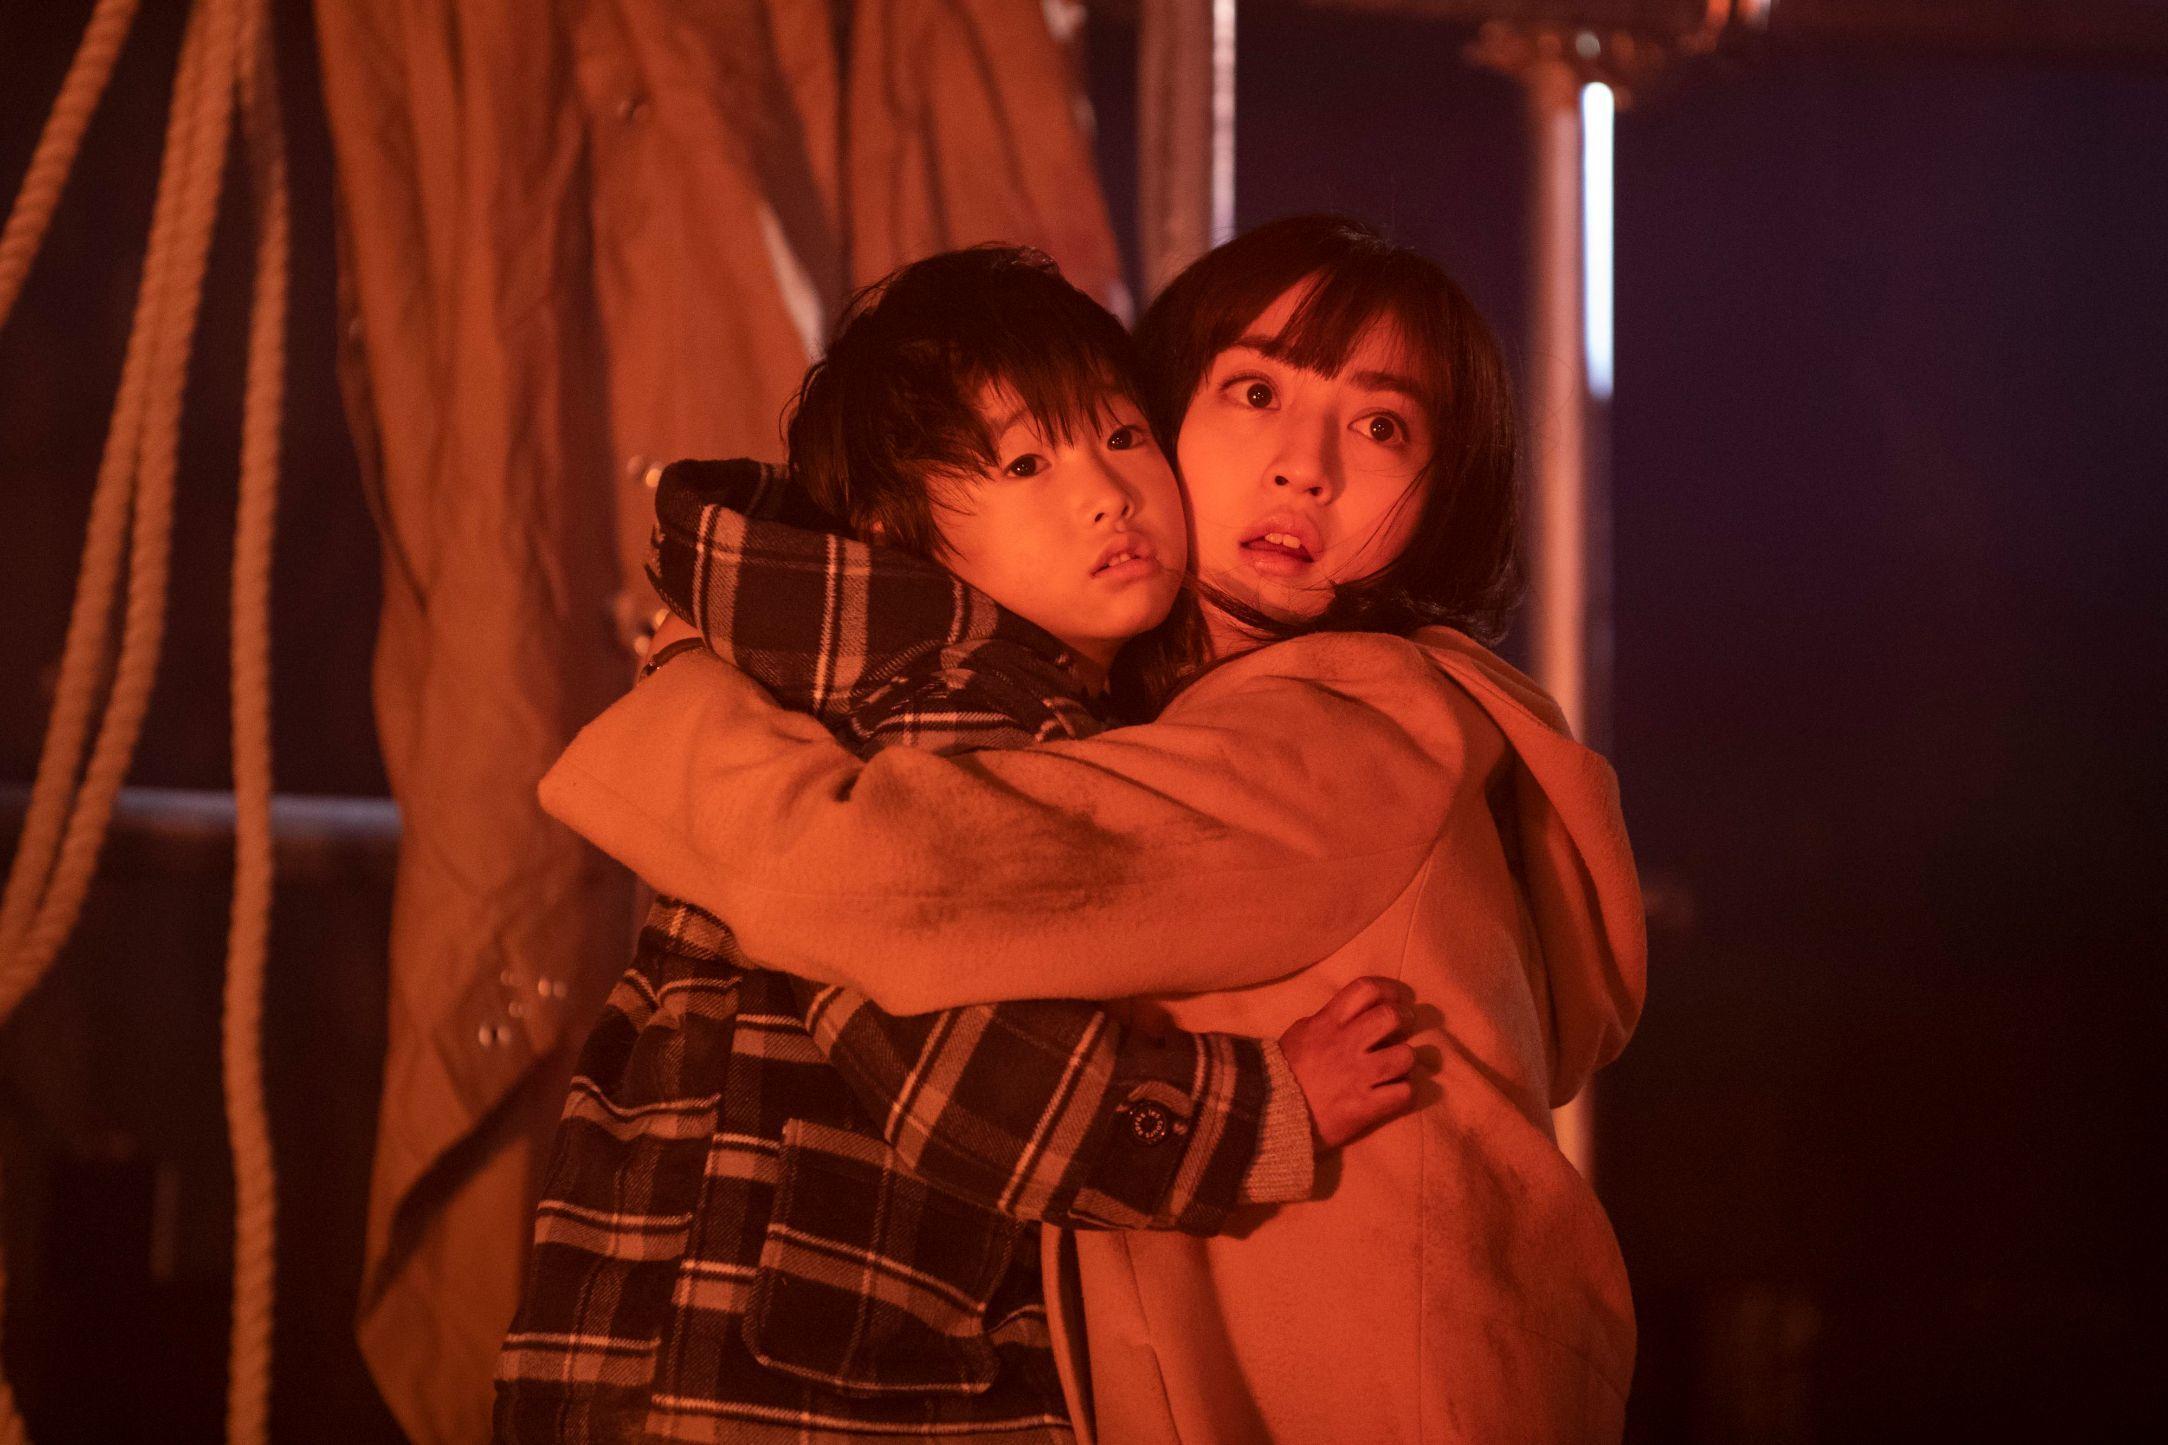 (C)2020 映画「妖怪人間ベラ」製作委員会